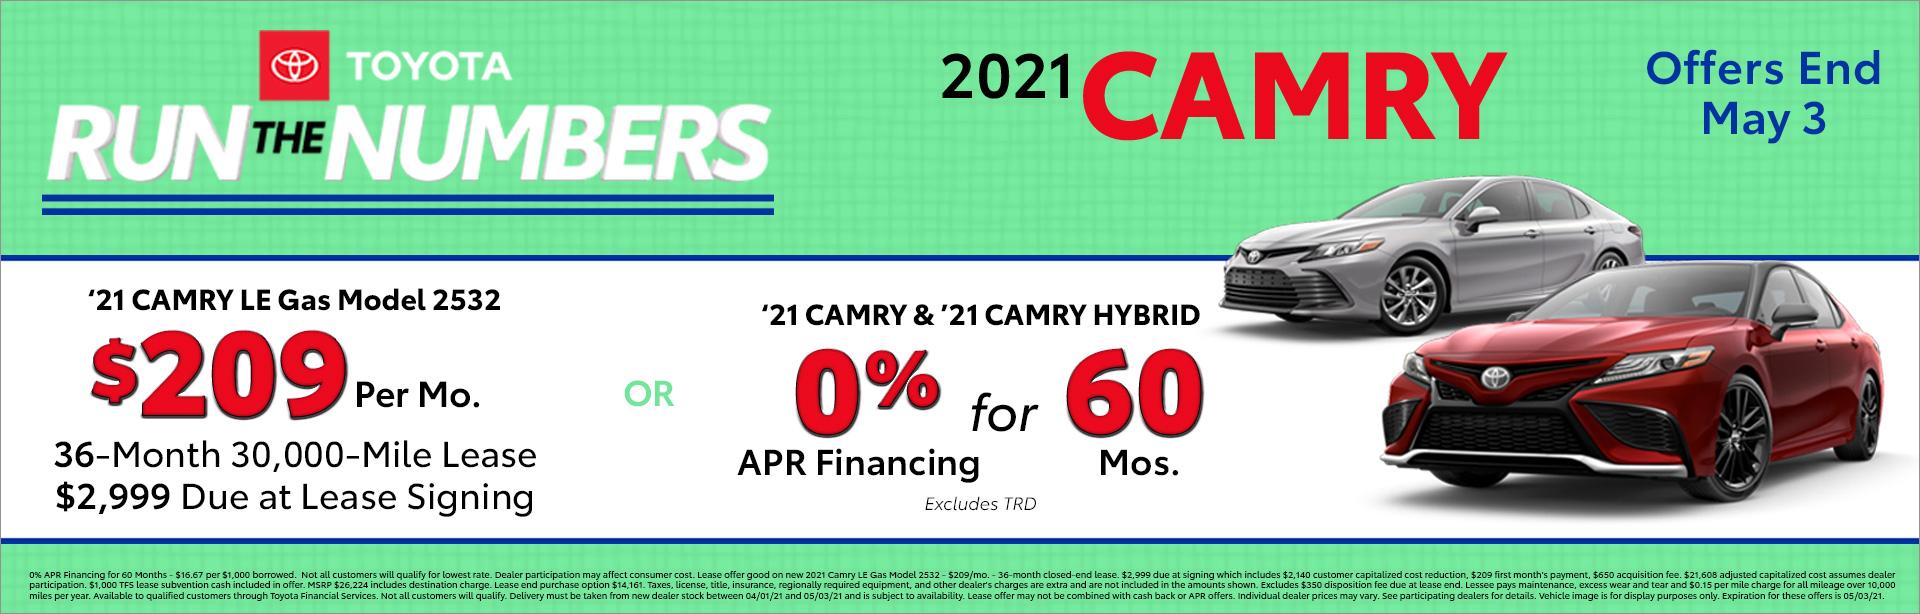 04-21_01_Cincinnati-April-2021-CIN-Run-the-numbers-Camry_1920x614_e2d5_Camry-Camry-Hybrid_O_xta.jpeg